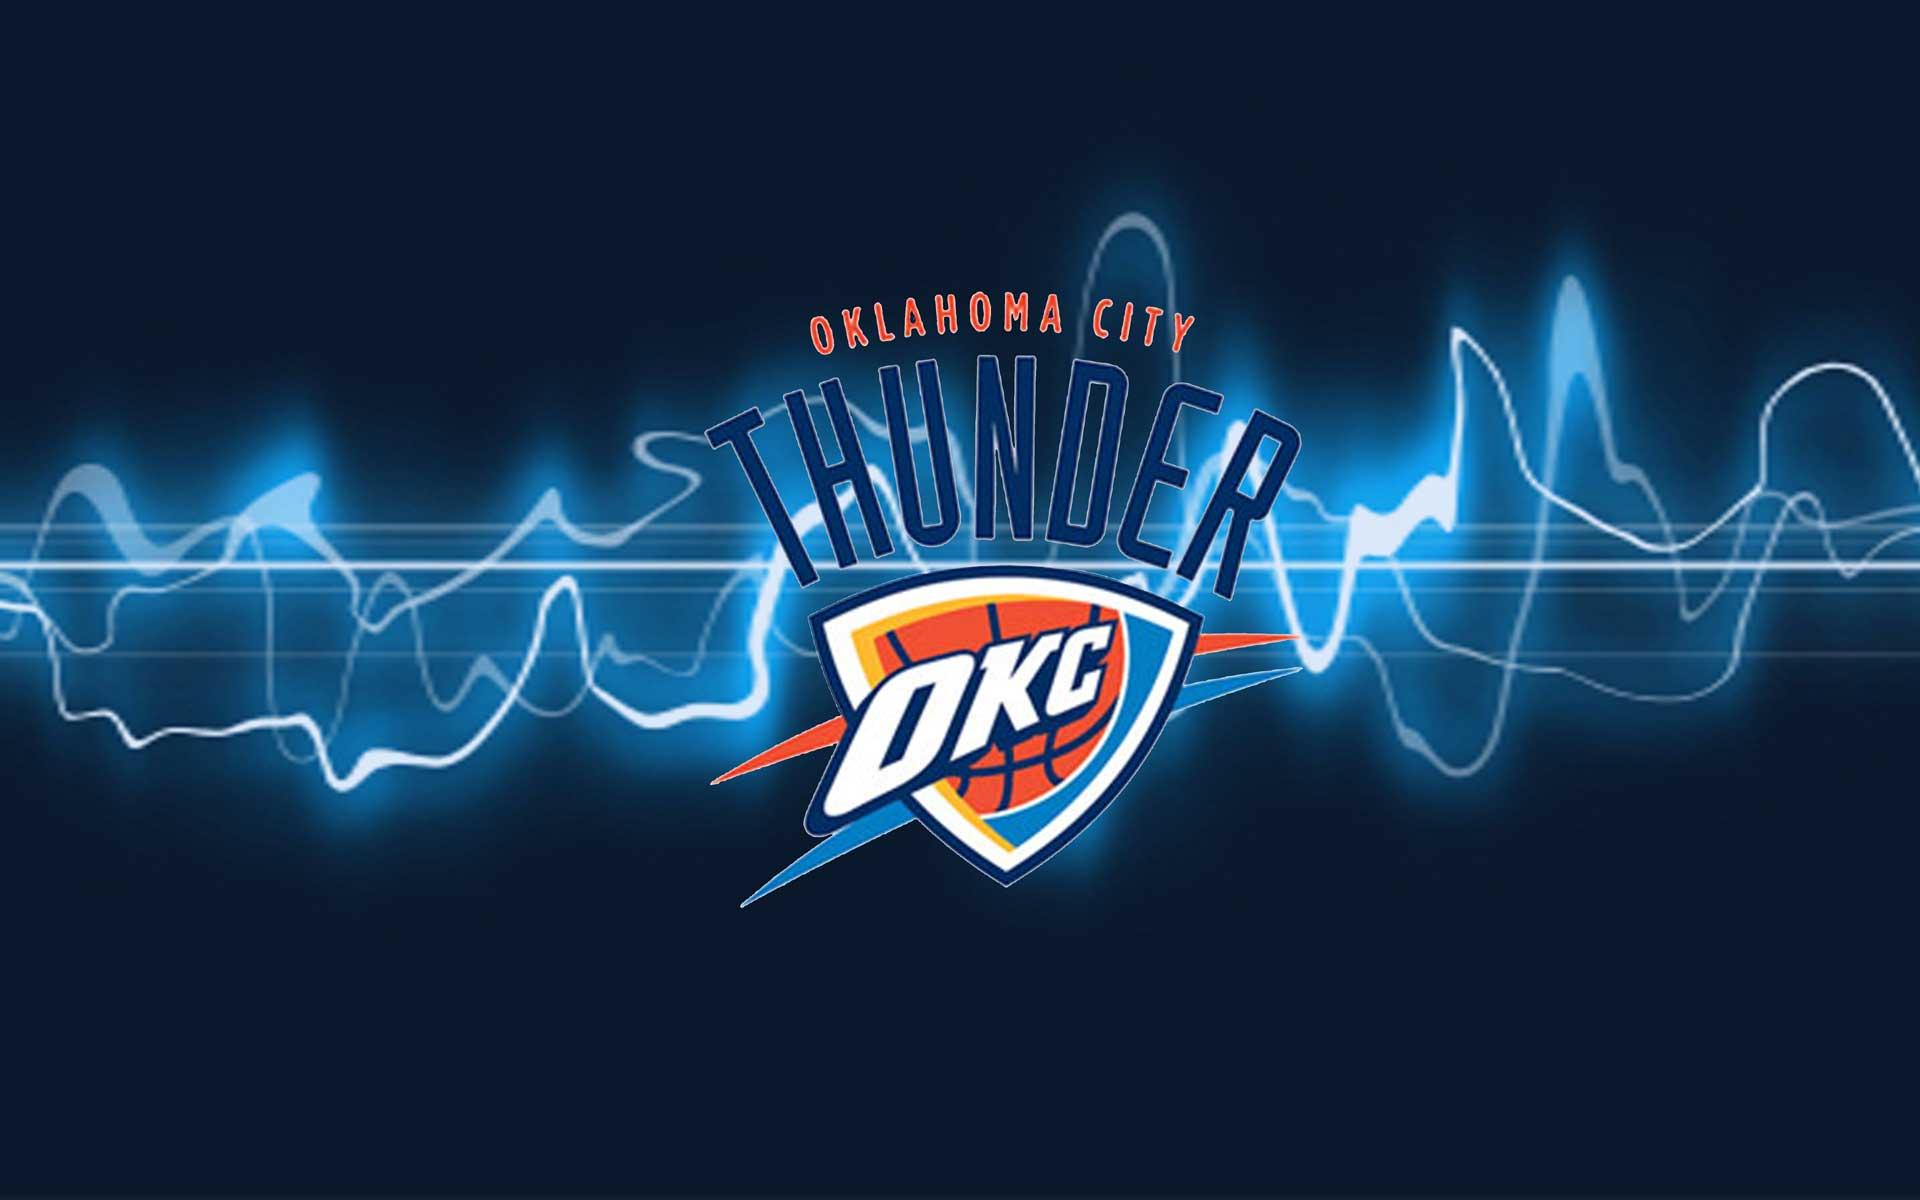 OKLAHOMA CITY THUNDER basketball nba f wallpaper 1920x1200 158403 1920x1200